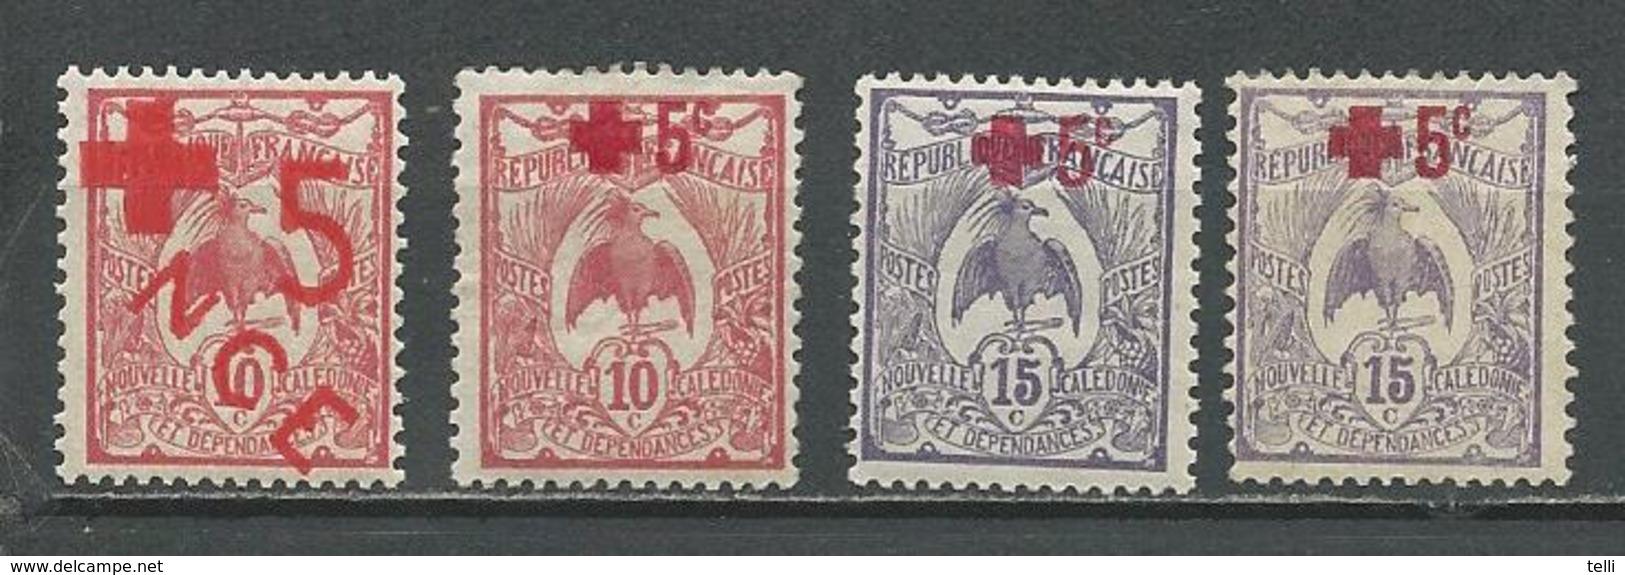 NLLE CALÉDONIE Scott B1, B2, B3 Yvert 110, 111, 112x2 (4) **, *, **, * Cote 3,90 $ 1915-17 - Nouvelle-Calédonie